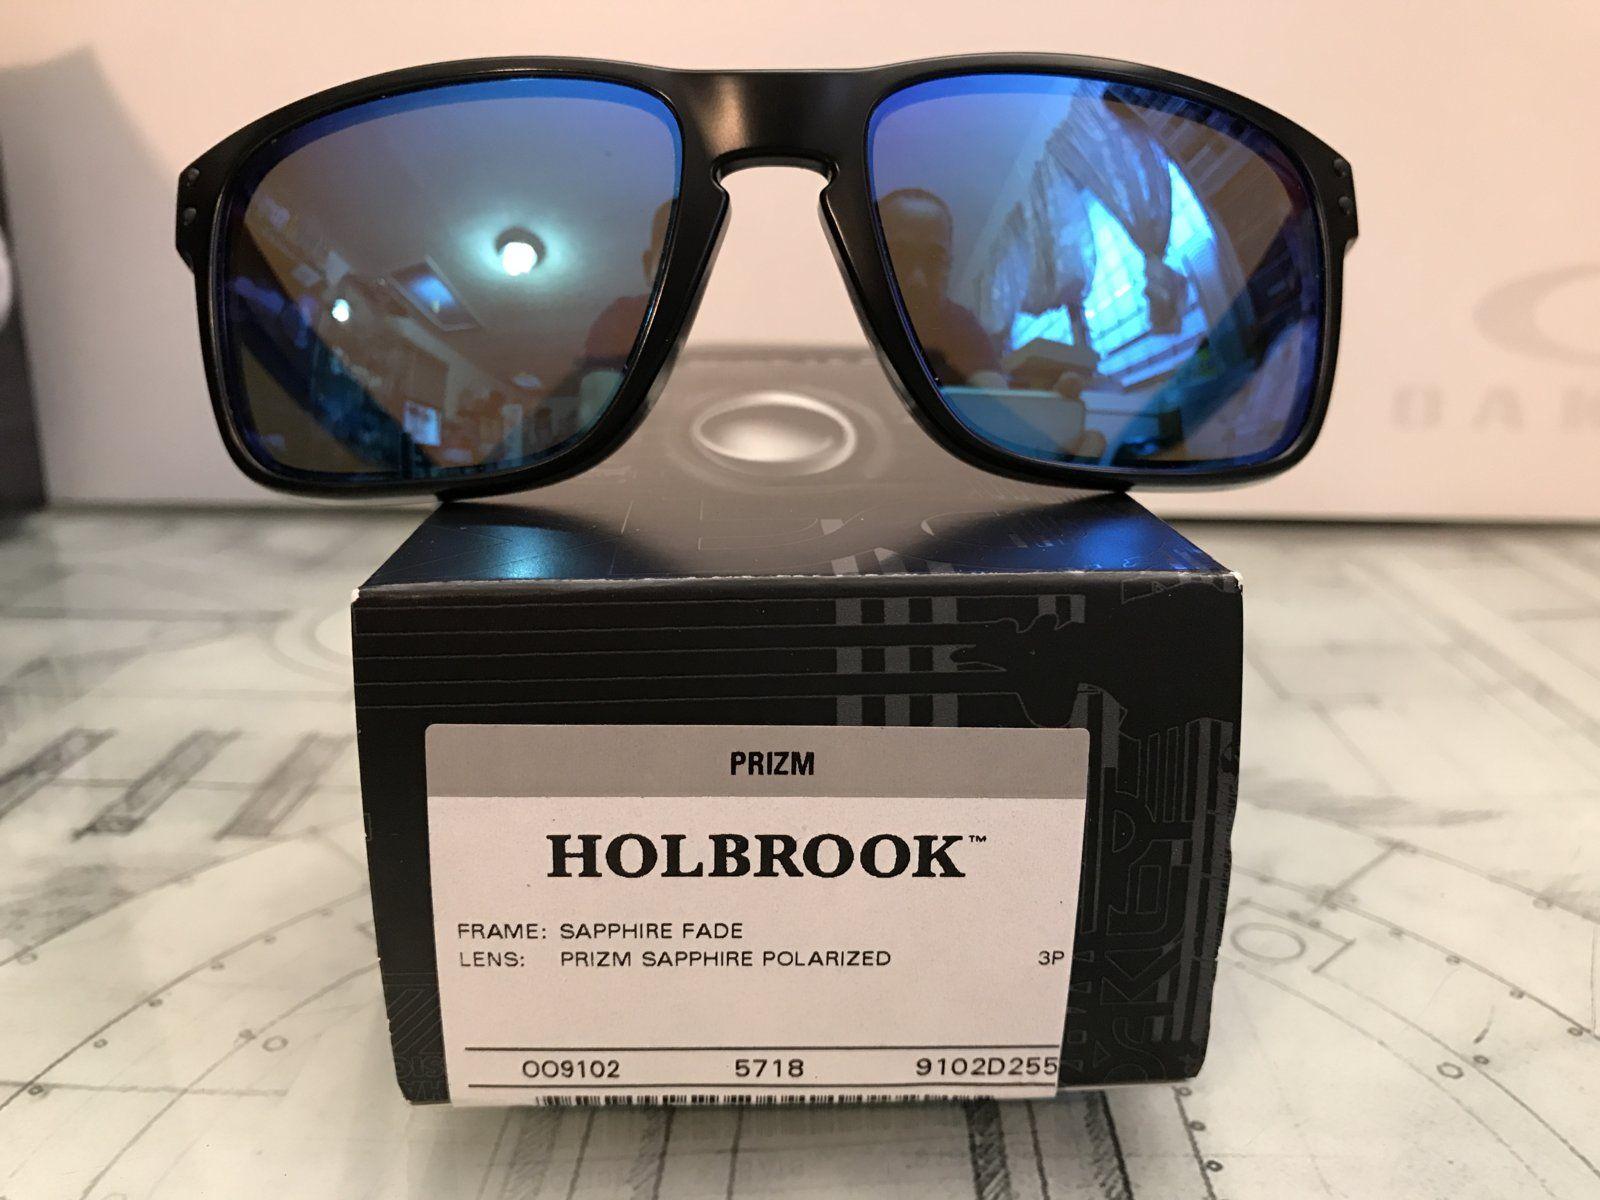 eefb8b54c0f OO9102-D255 Sapphire Fade Prizm sapphire polarized Holbrook--  110 -  IMG 9524.